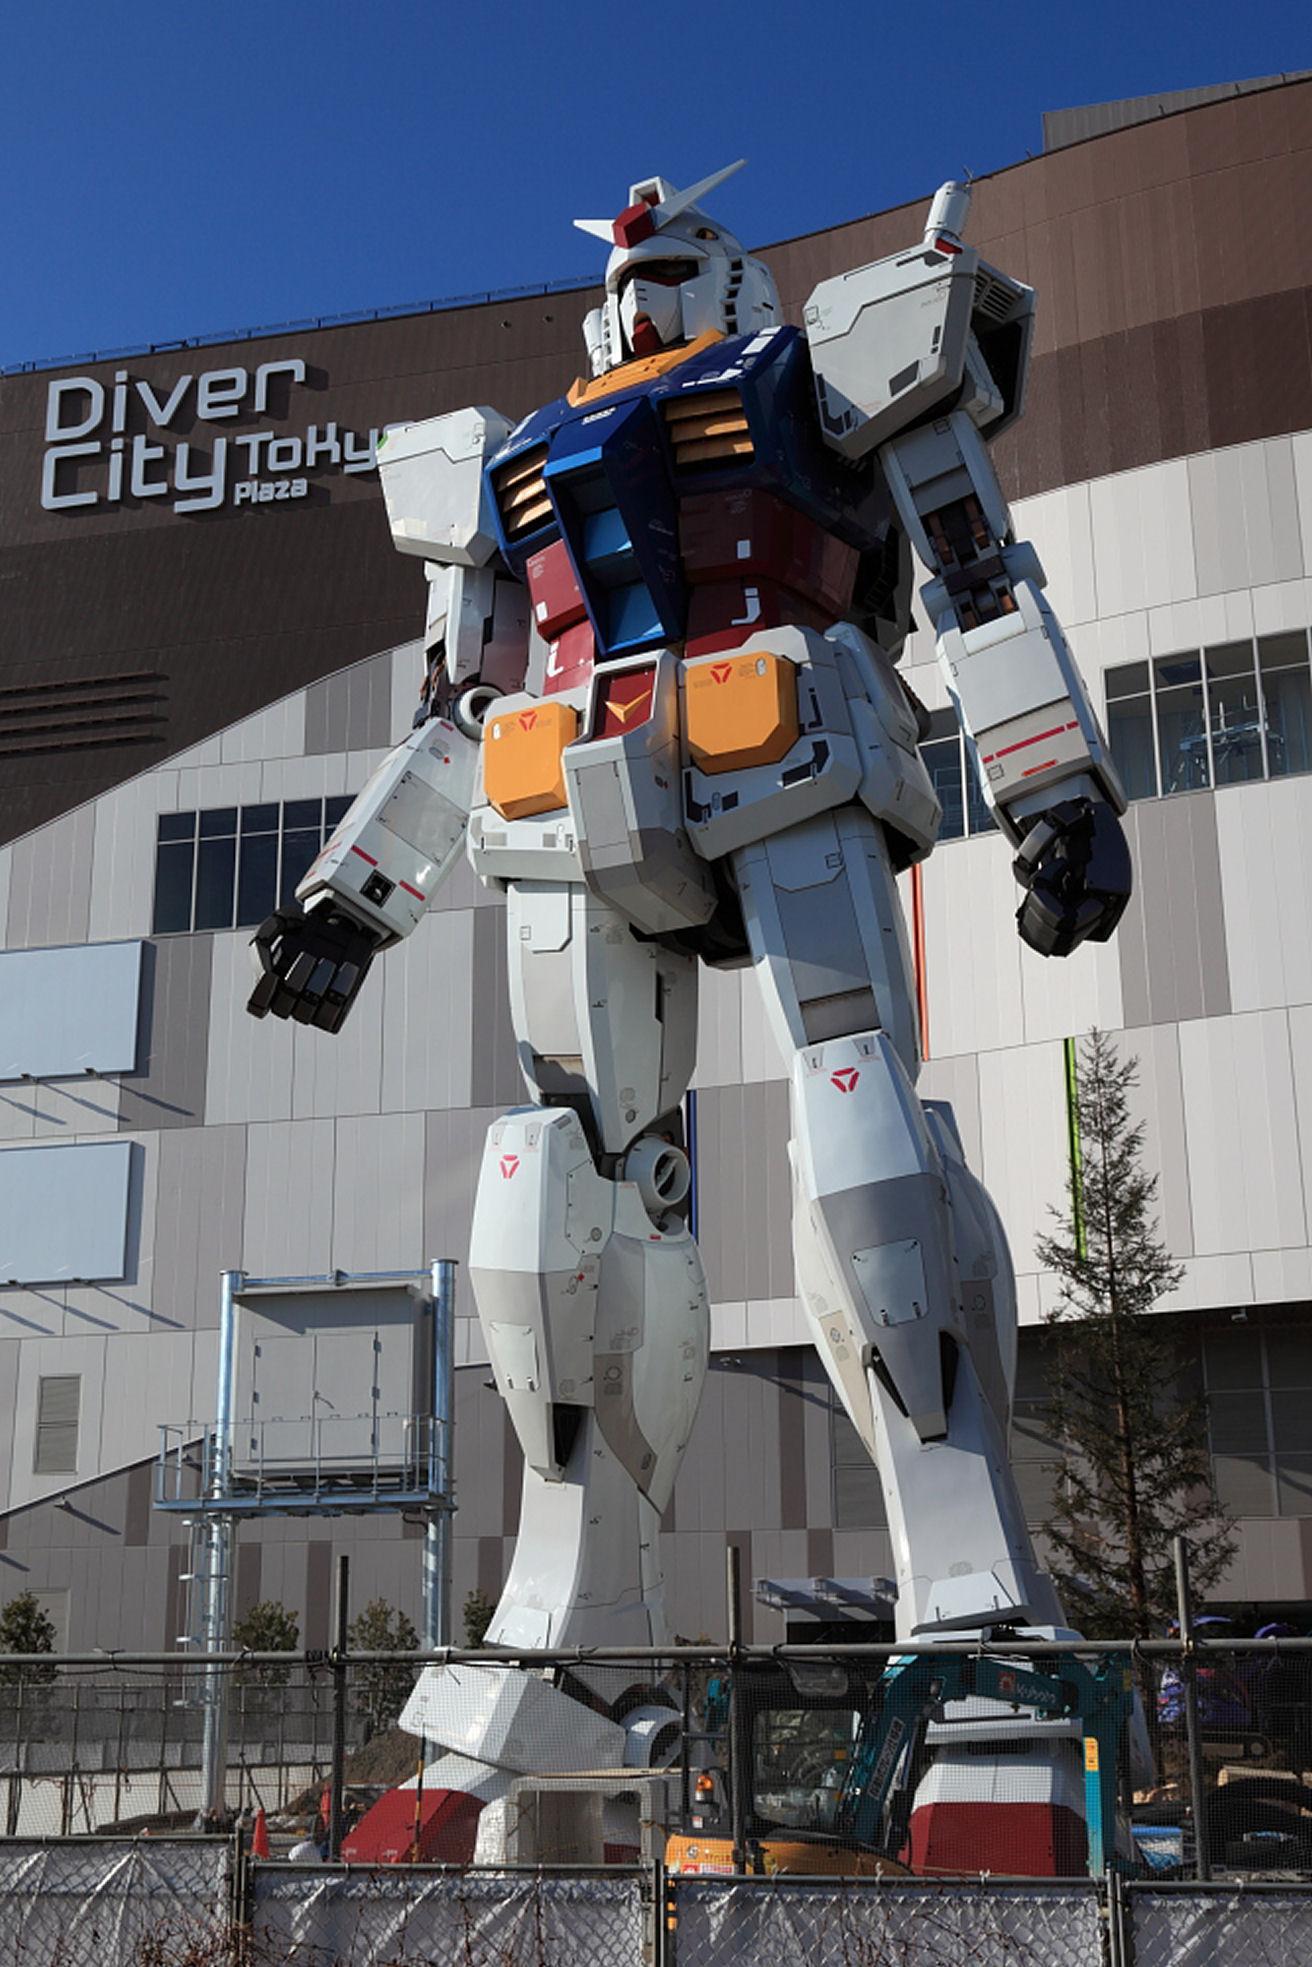 1 1 Life Size Gundam Statue Diver City Tokyo Odaiba